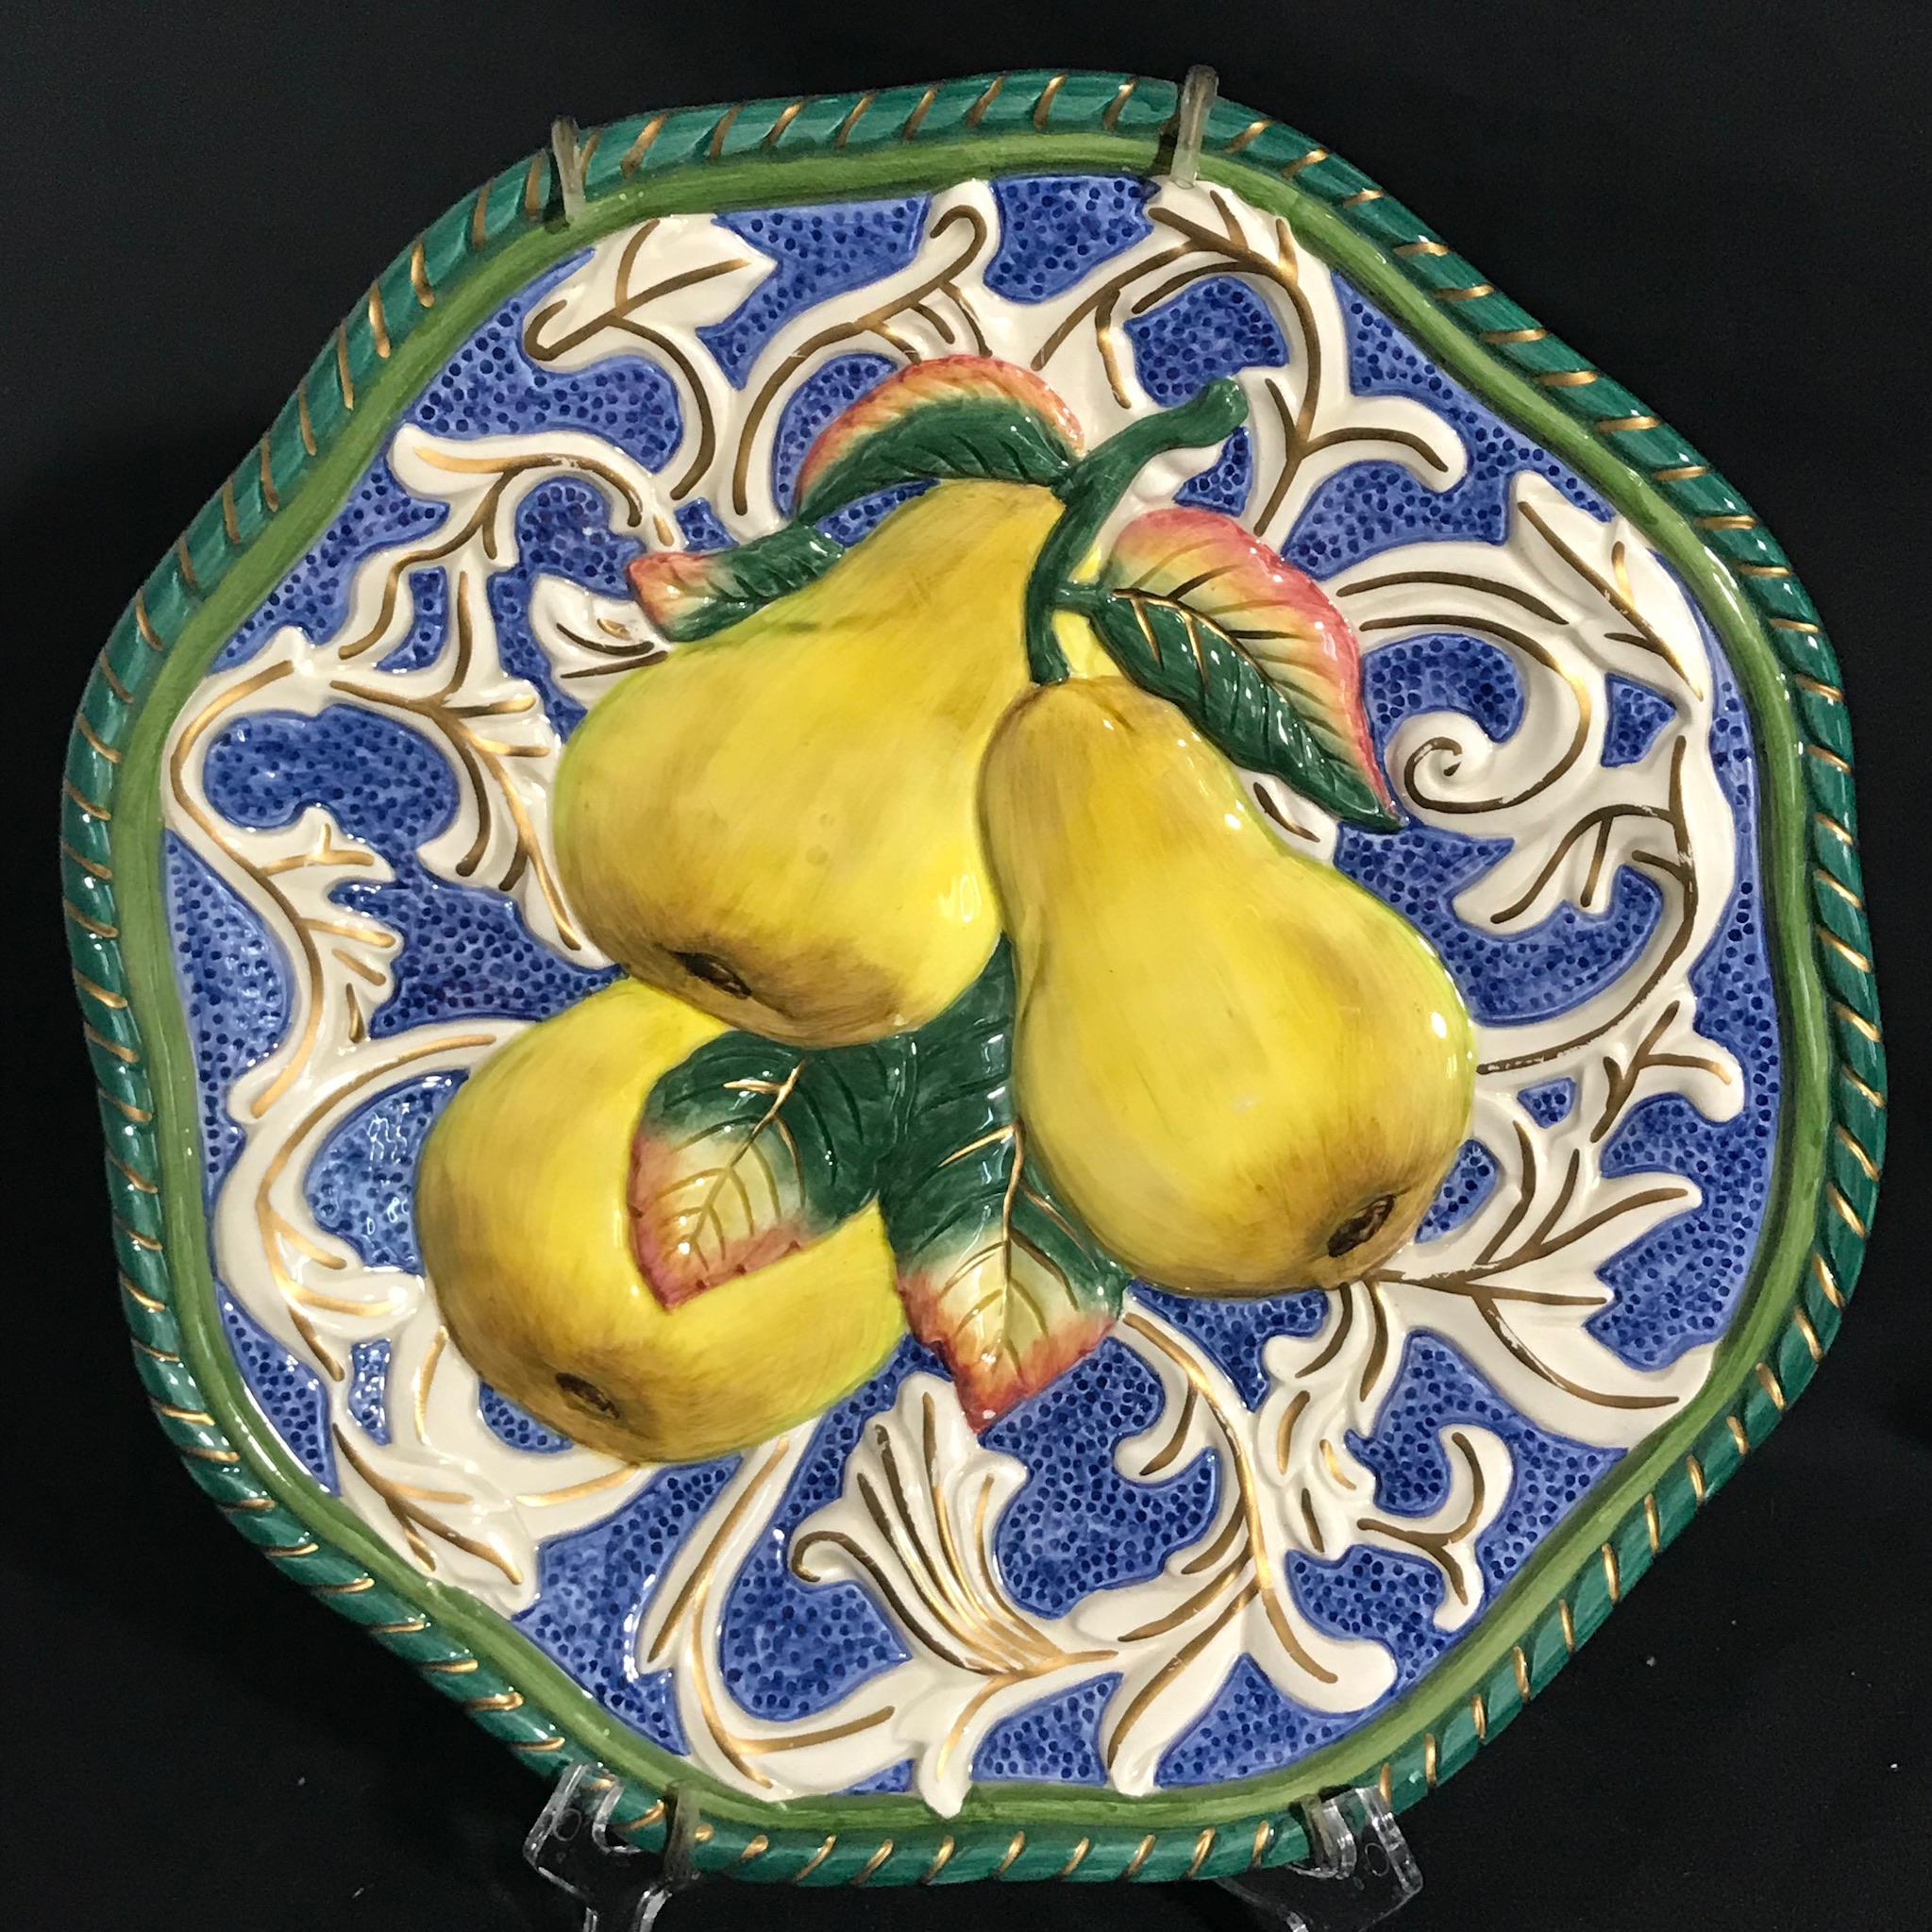 Fitz u0026 Floyd Florentine Fruit Canapé Wall Plates - Set of 3 - Image 5 of  sc 1 st  Chairish & Fitz u0026 Floyd Florentine Fruit Canapé Wall Plates - Set of 3 | Chairish